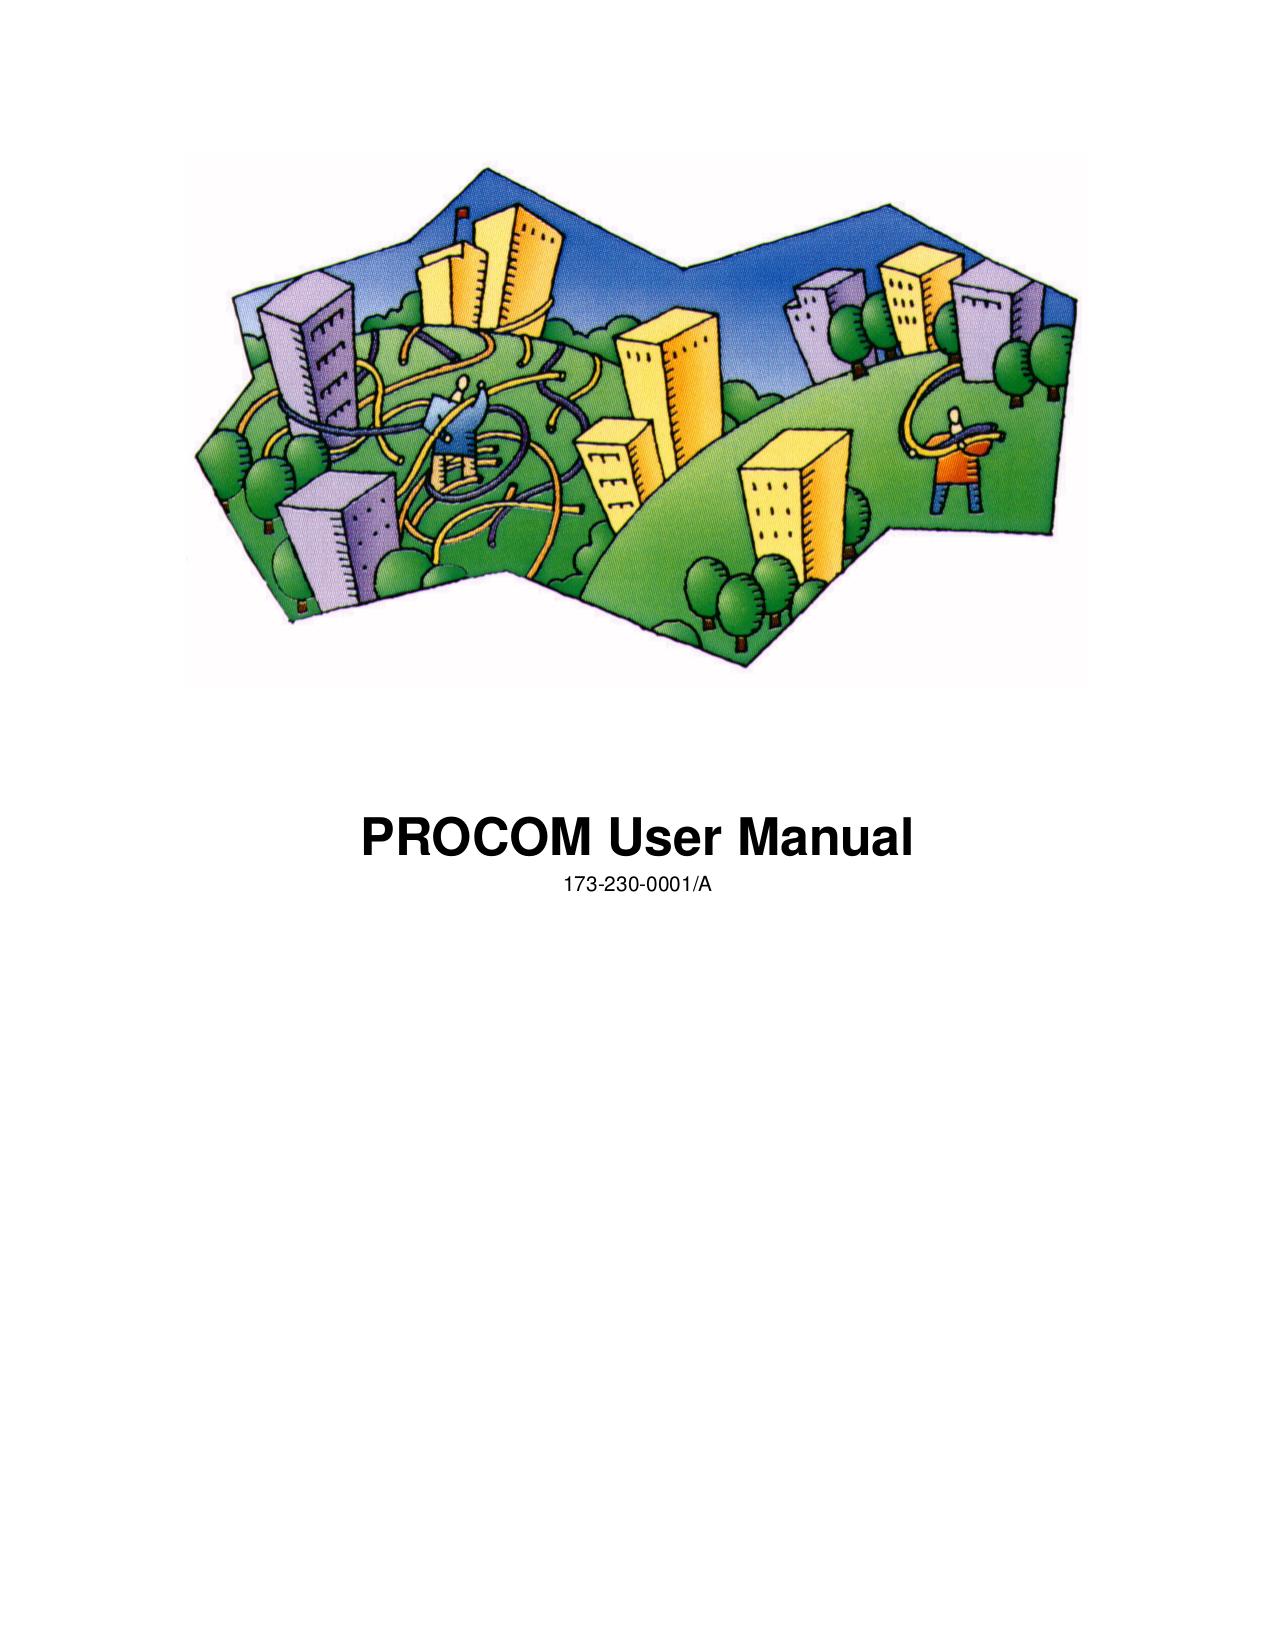 pdf for Keyspan Other 4-Port Print Server 1.3.1 Print Server manual